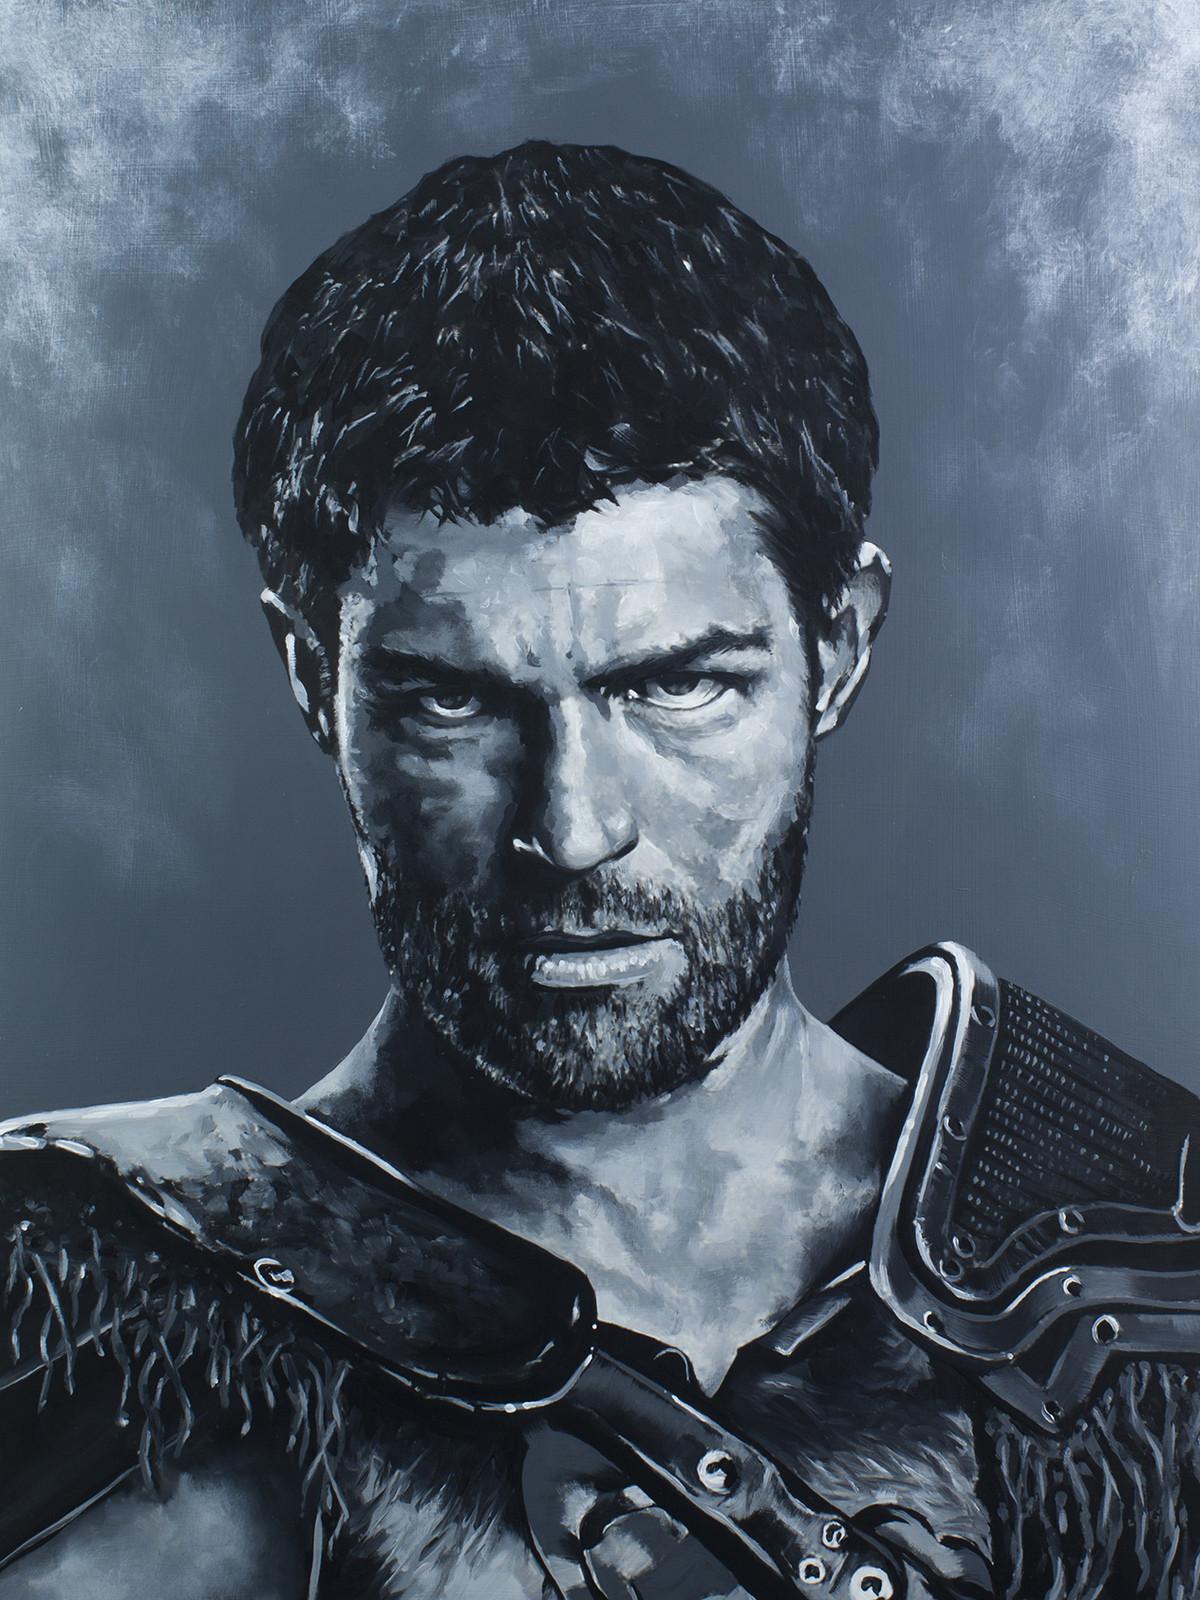 Spartacus - Liam McIntyre Spartacus Series - Acrylic on board. 16x20